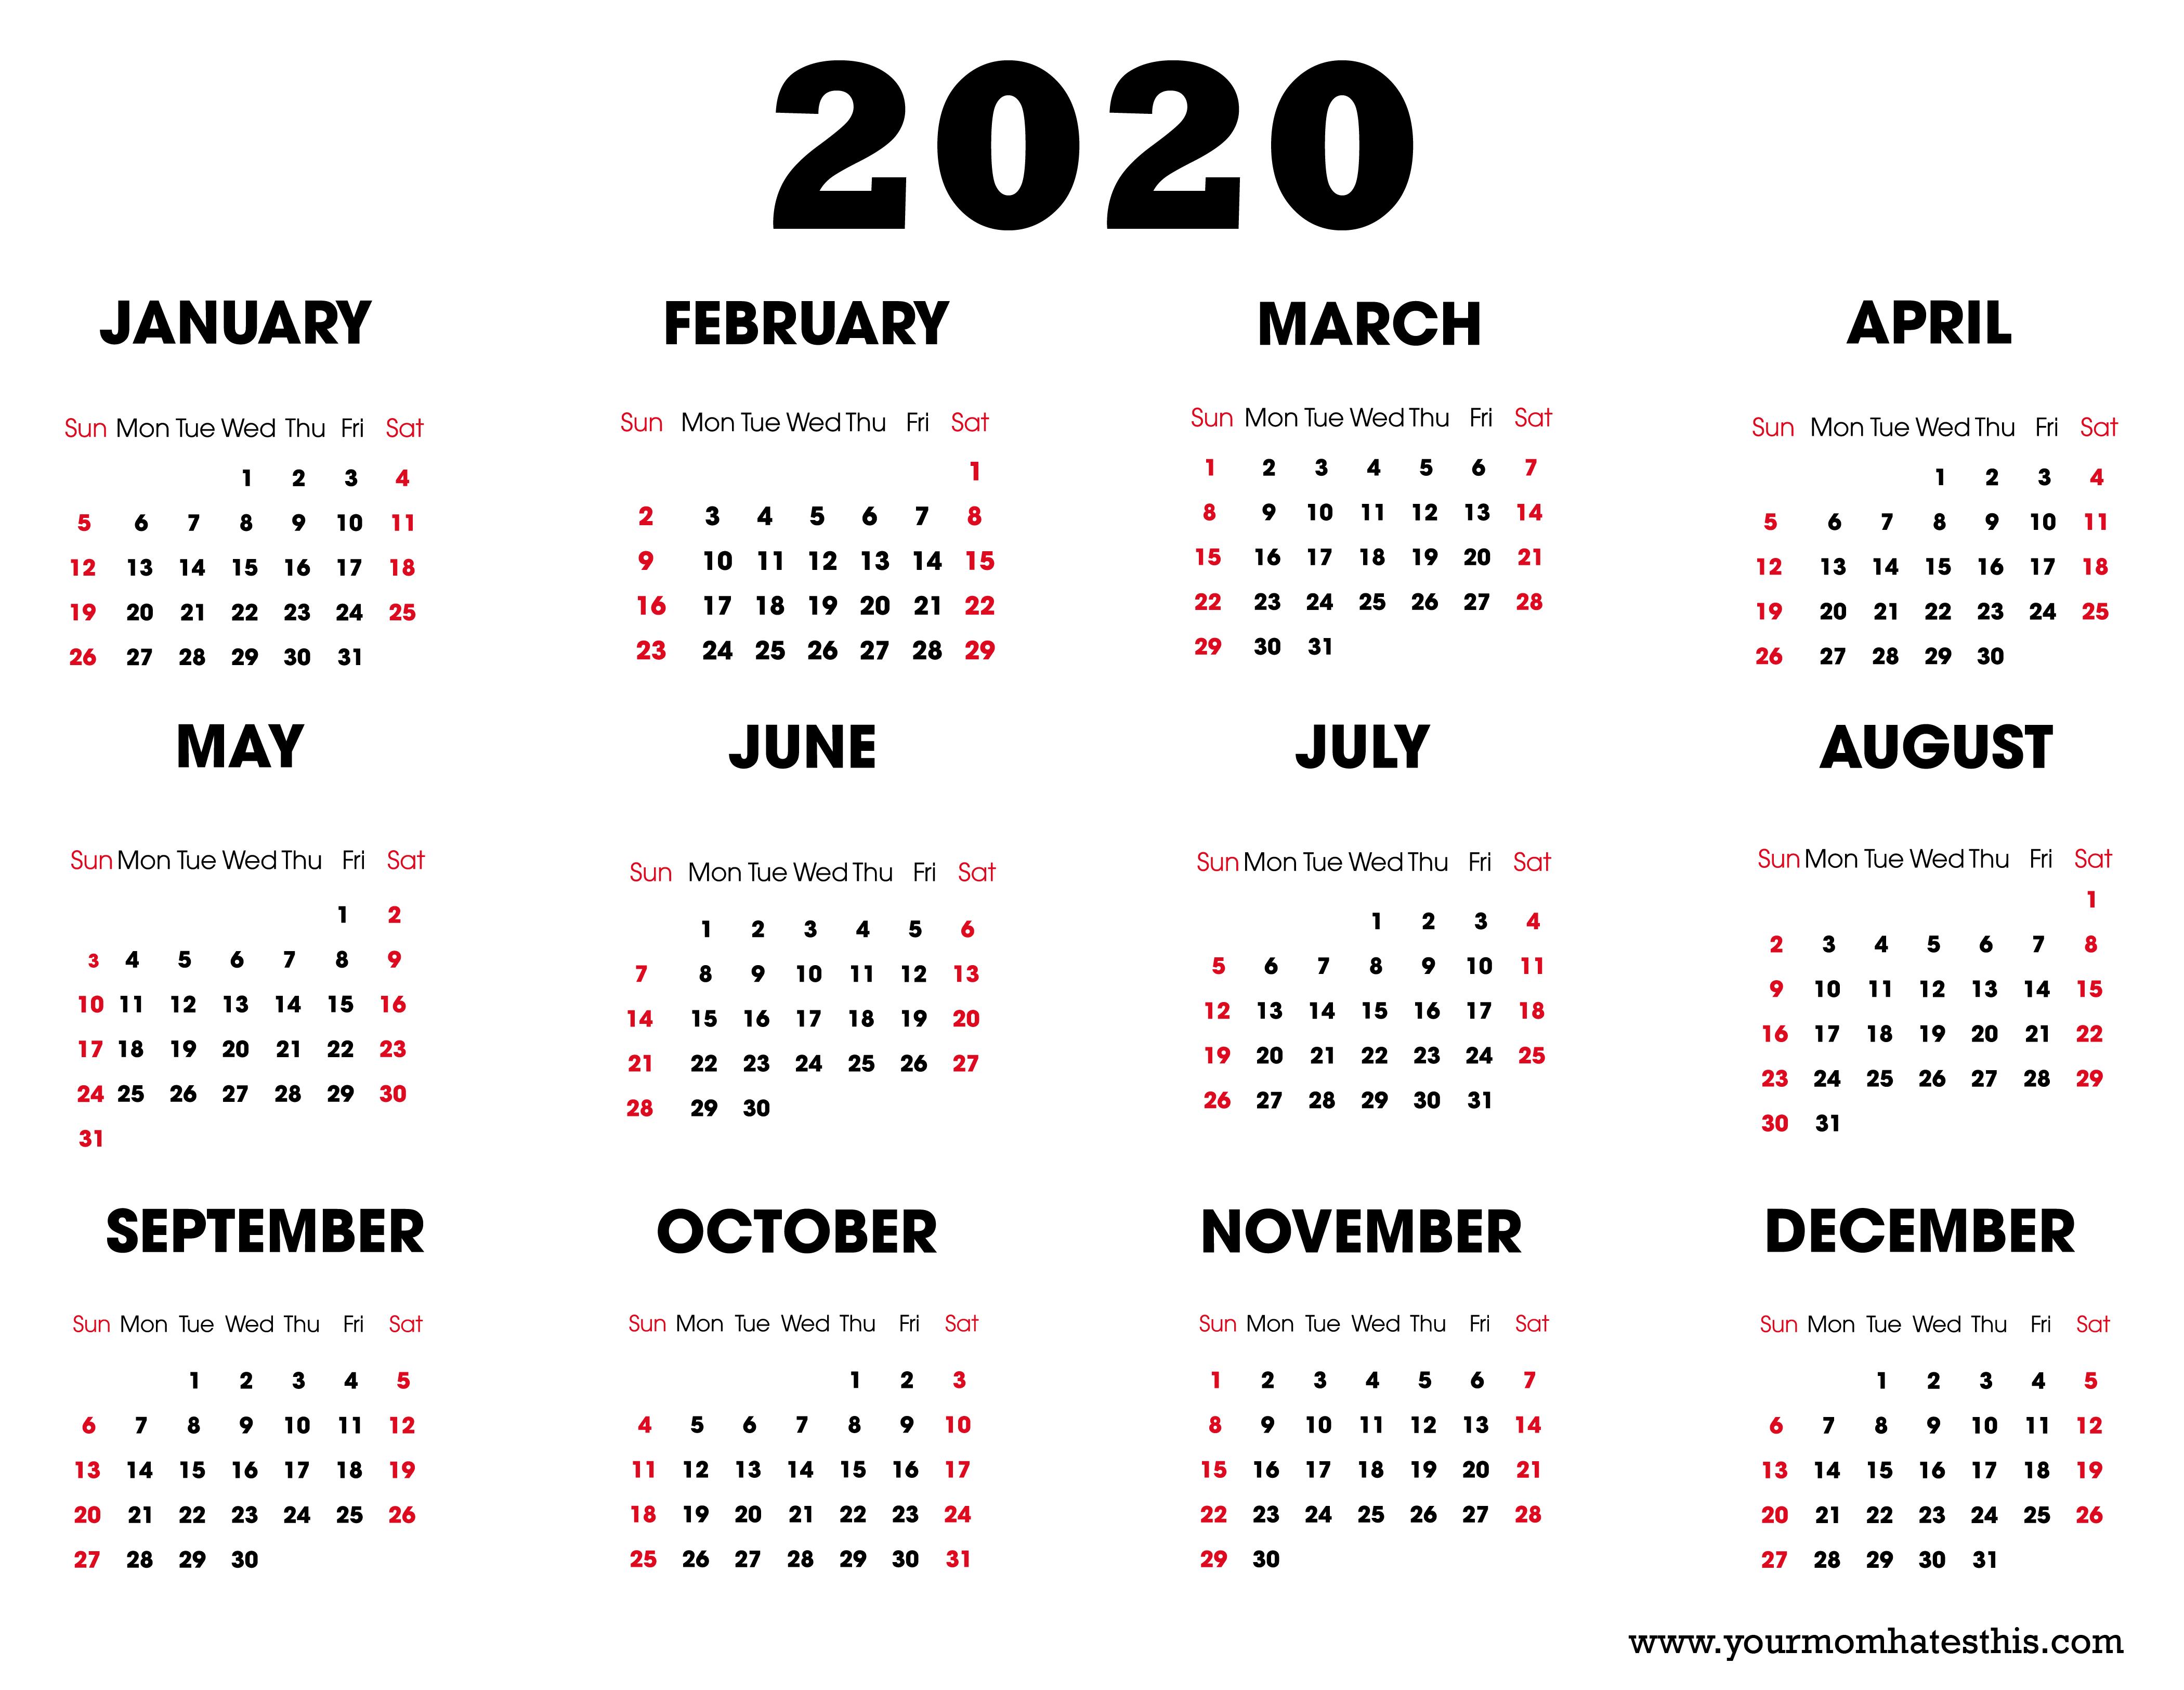 2020 Printable Calendar - Download Free Blank Templates - Daily in Printable 2020 Calendars No Download